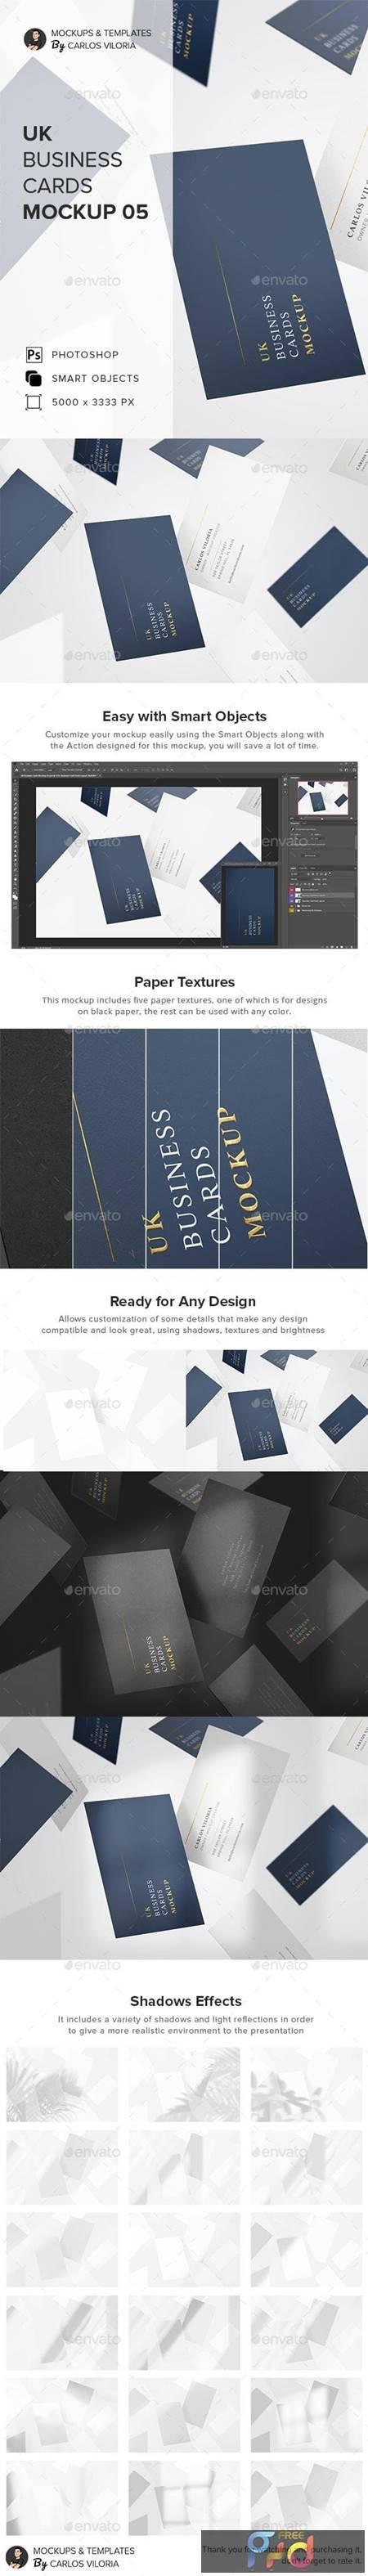 UK Business Cards Mockup 05 27618098 1